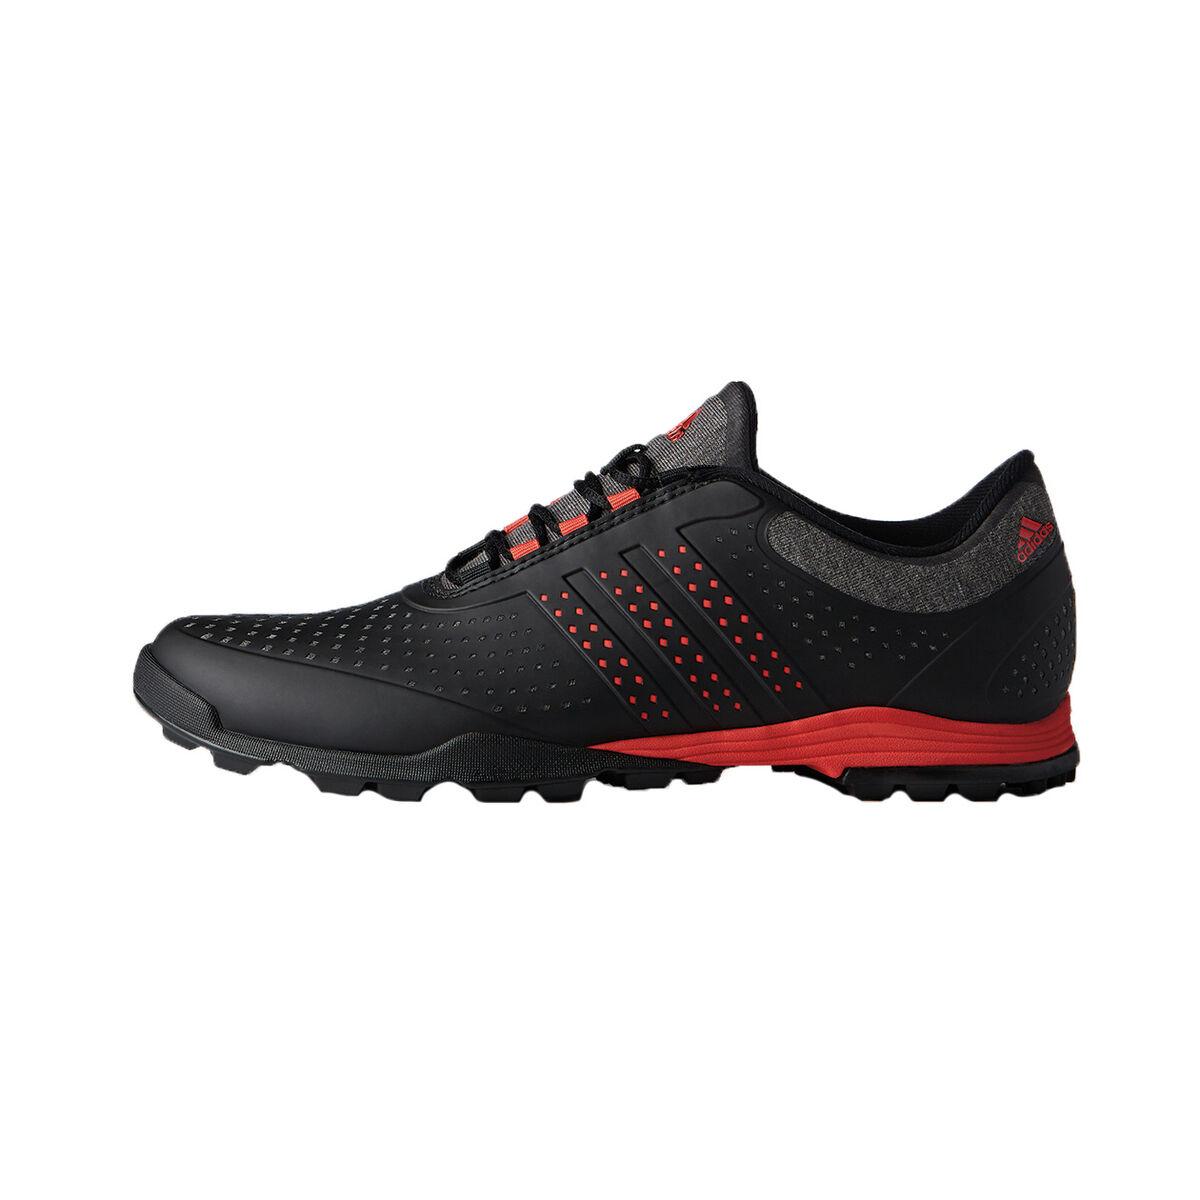 adidas adiPure Sport Women s Golf Shoe - Black Red 20e6f1775